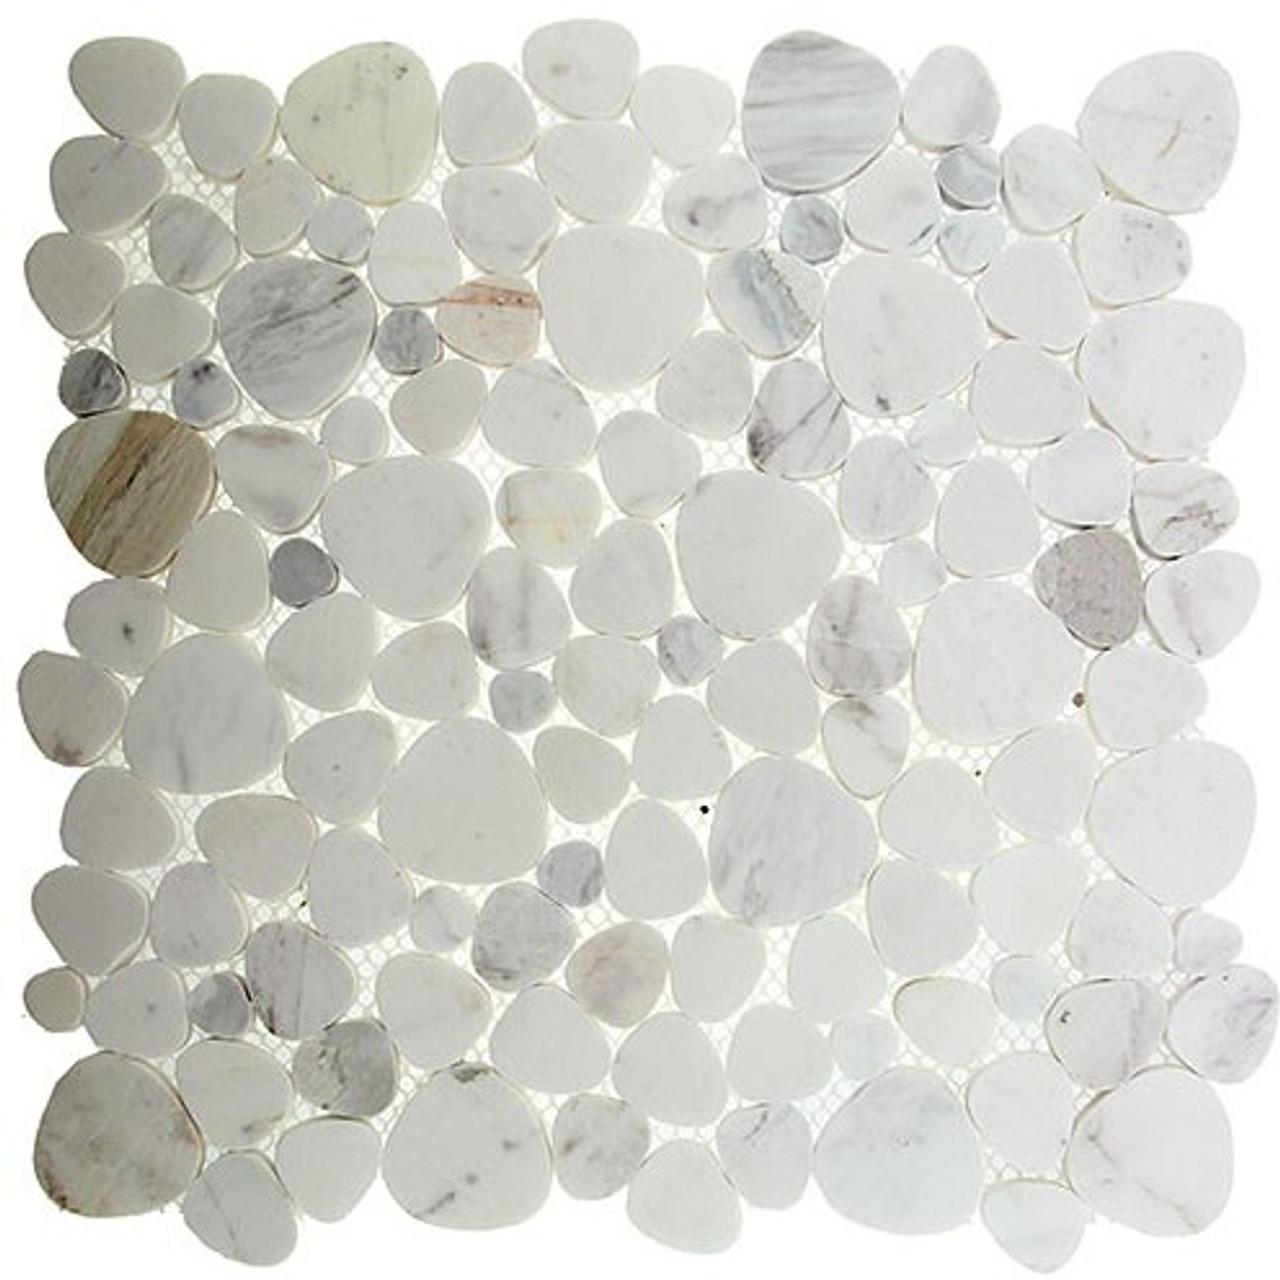 Bella Glass Tiles Holy Trail HT-147 marble mosaic Yam Hamelach